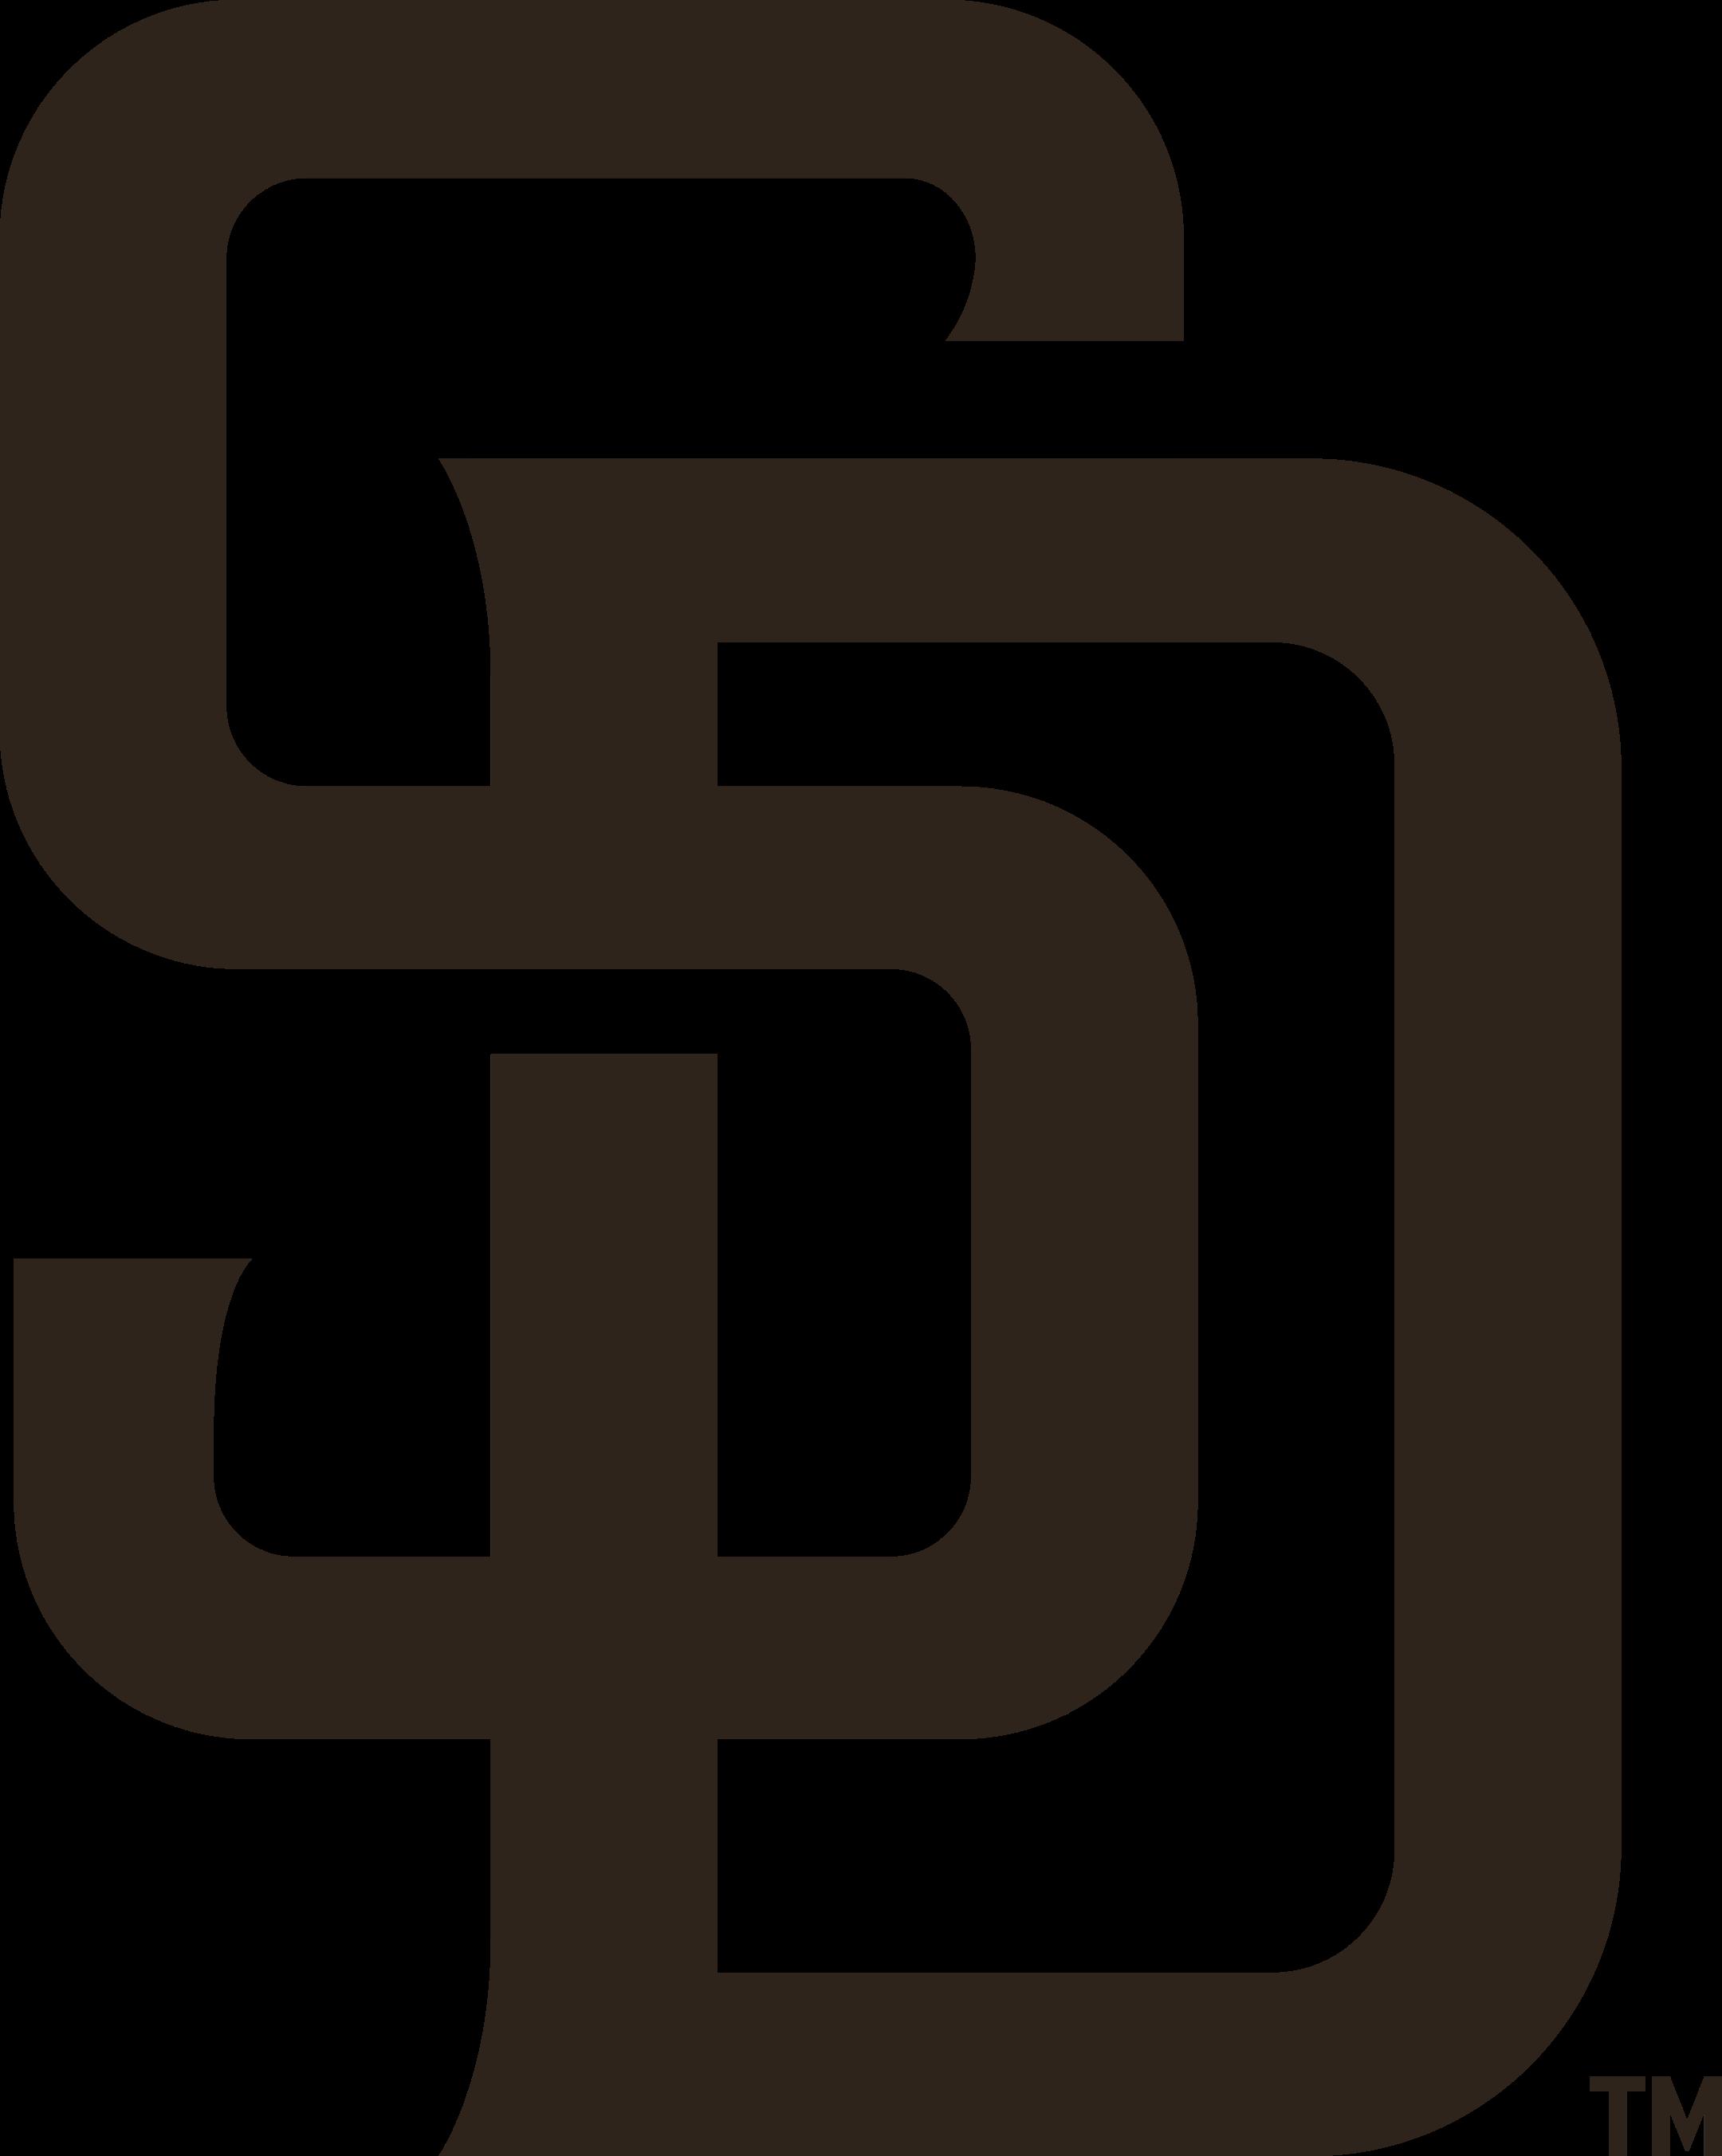 san diego padres logo 2 - San Diego Padres Logo